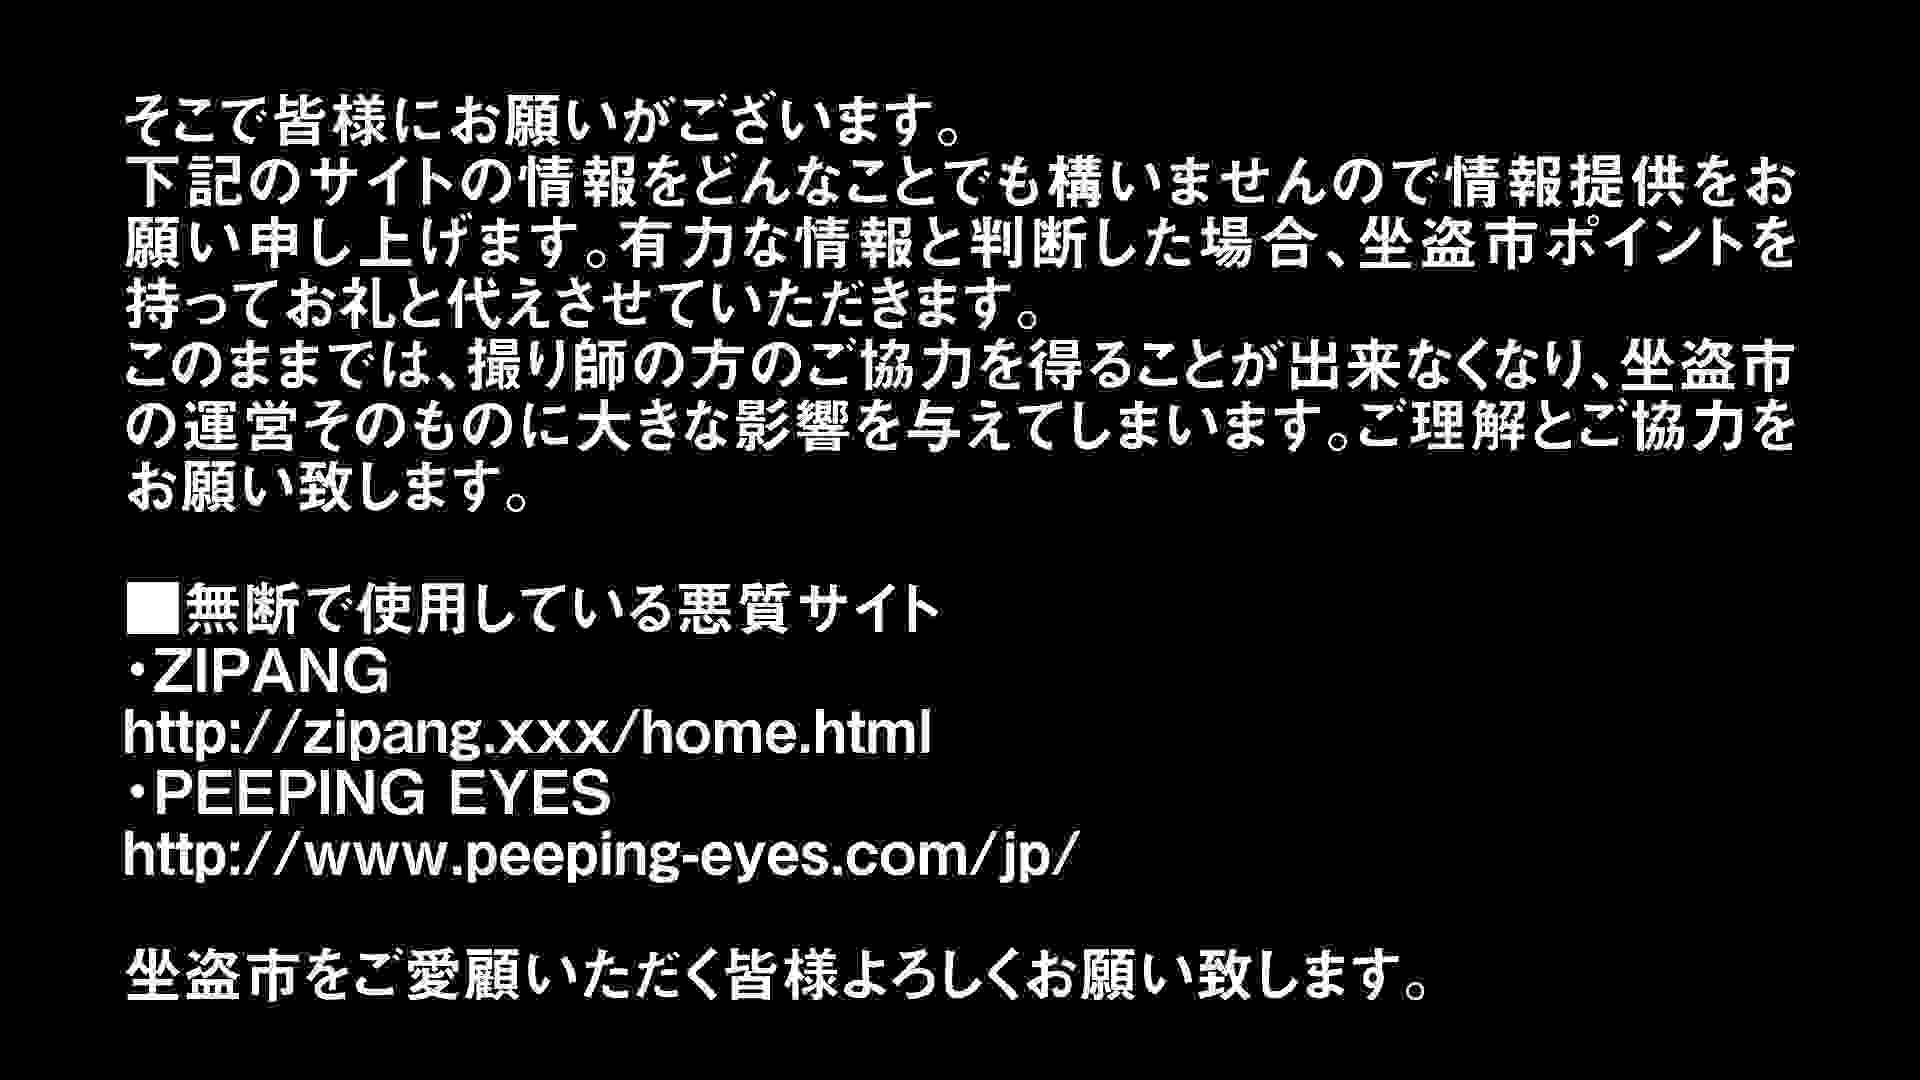 Aquaな露天風呂Vol.303 盗撮シリーズ   露天風呂編  90PIX 3